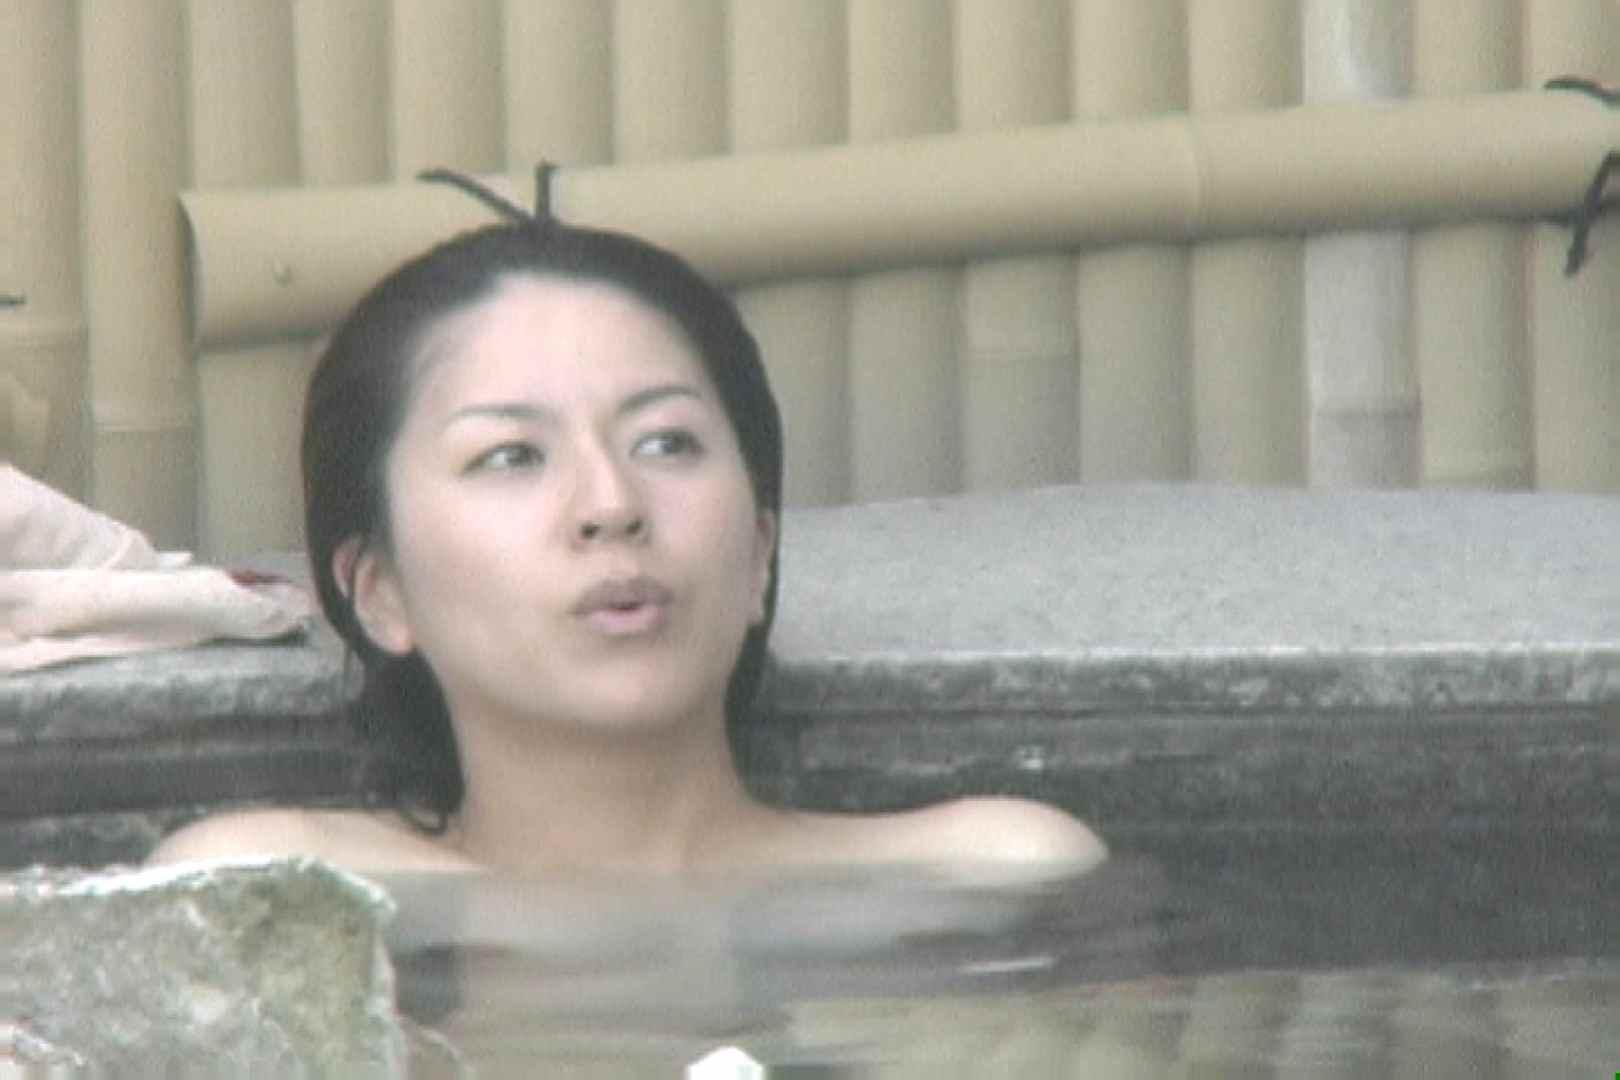 Aquaな露天風呂Vol.694 盗撮 | OLエロ画像  110PICs 46